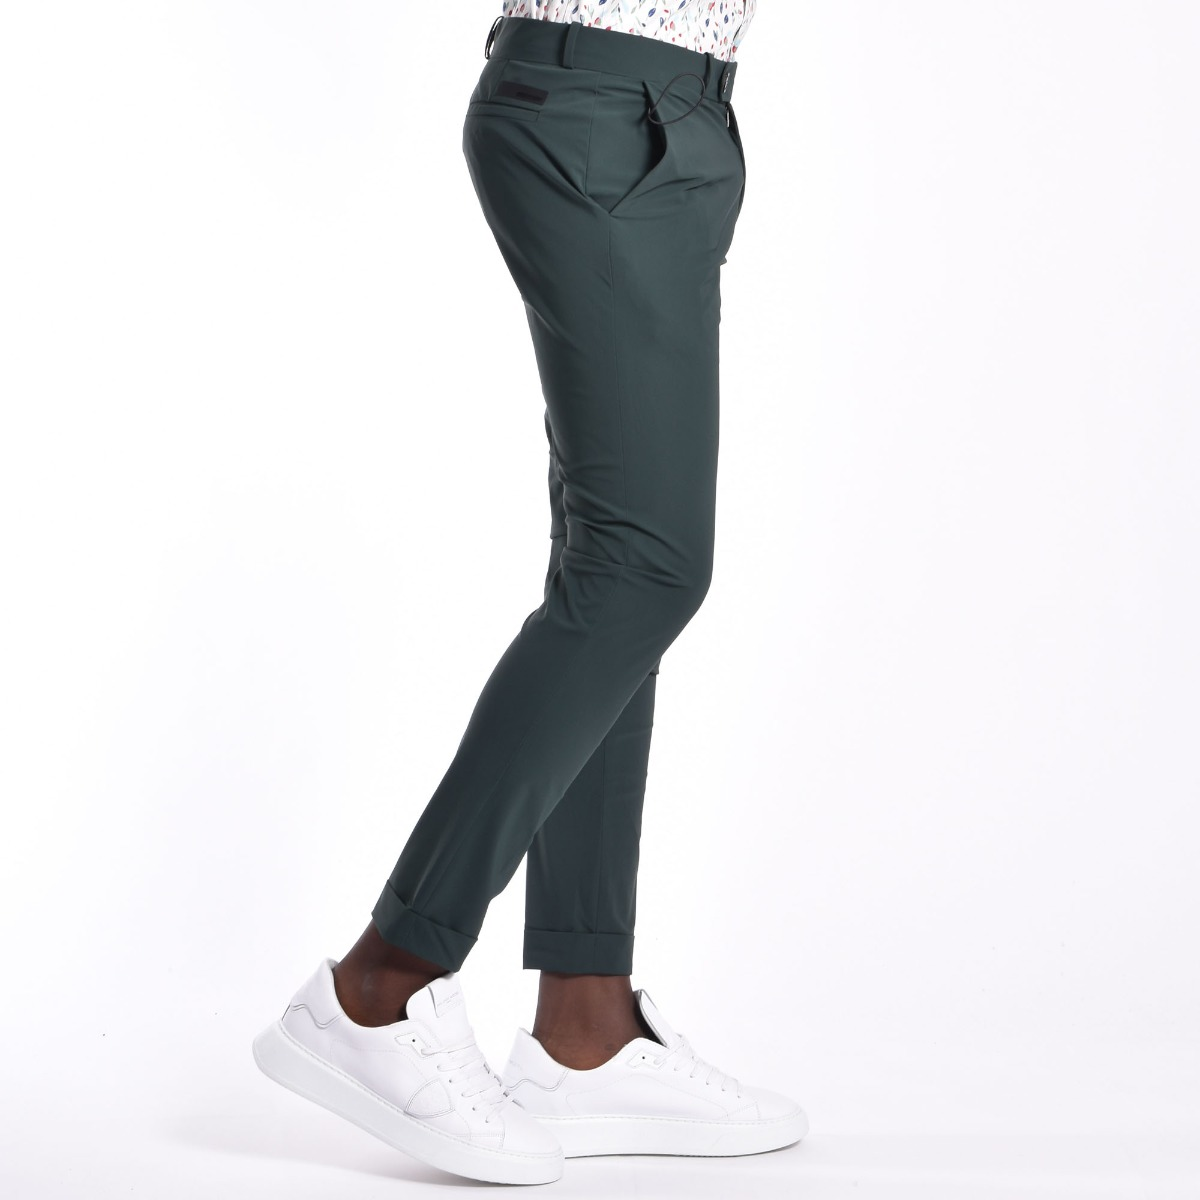 Pantalone chino - Verde scuro